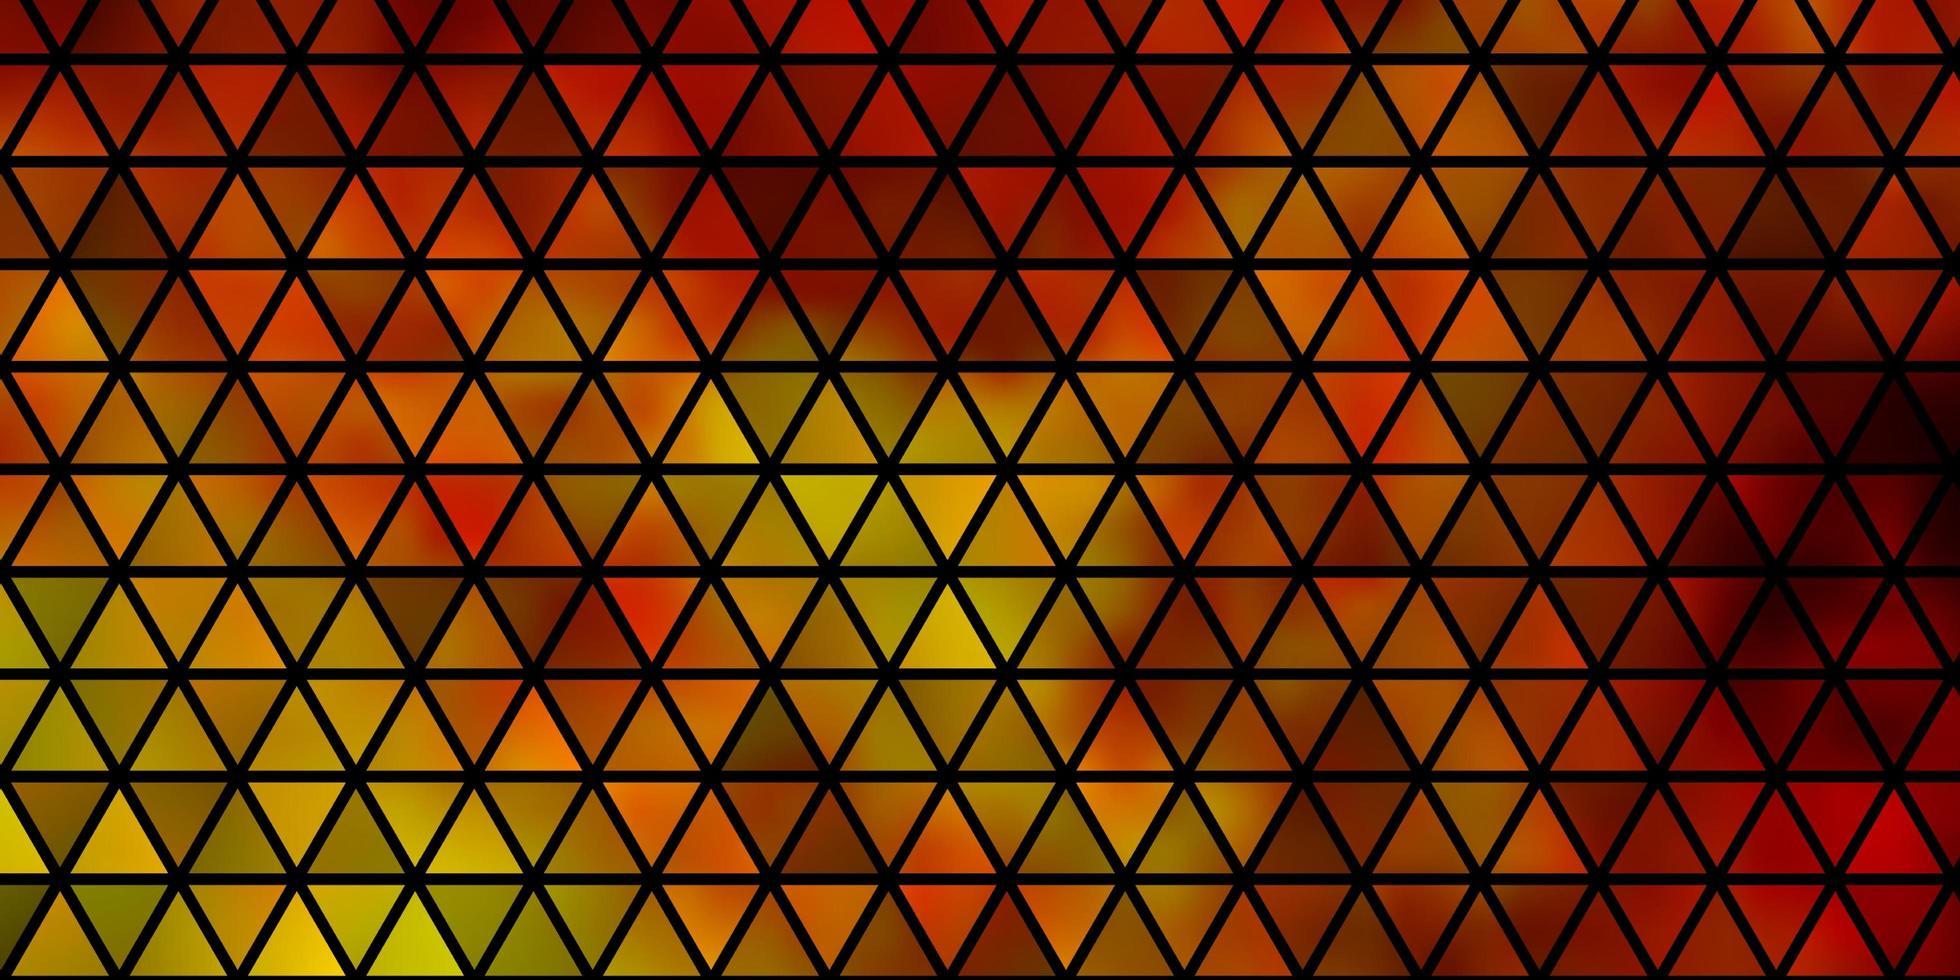 pano de fundo vector laranja claro com linhas, triângulos.